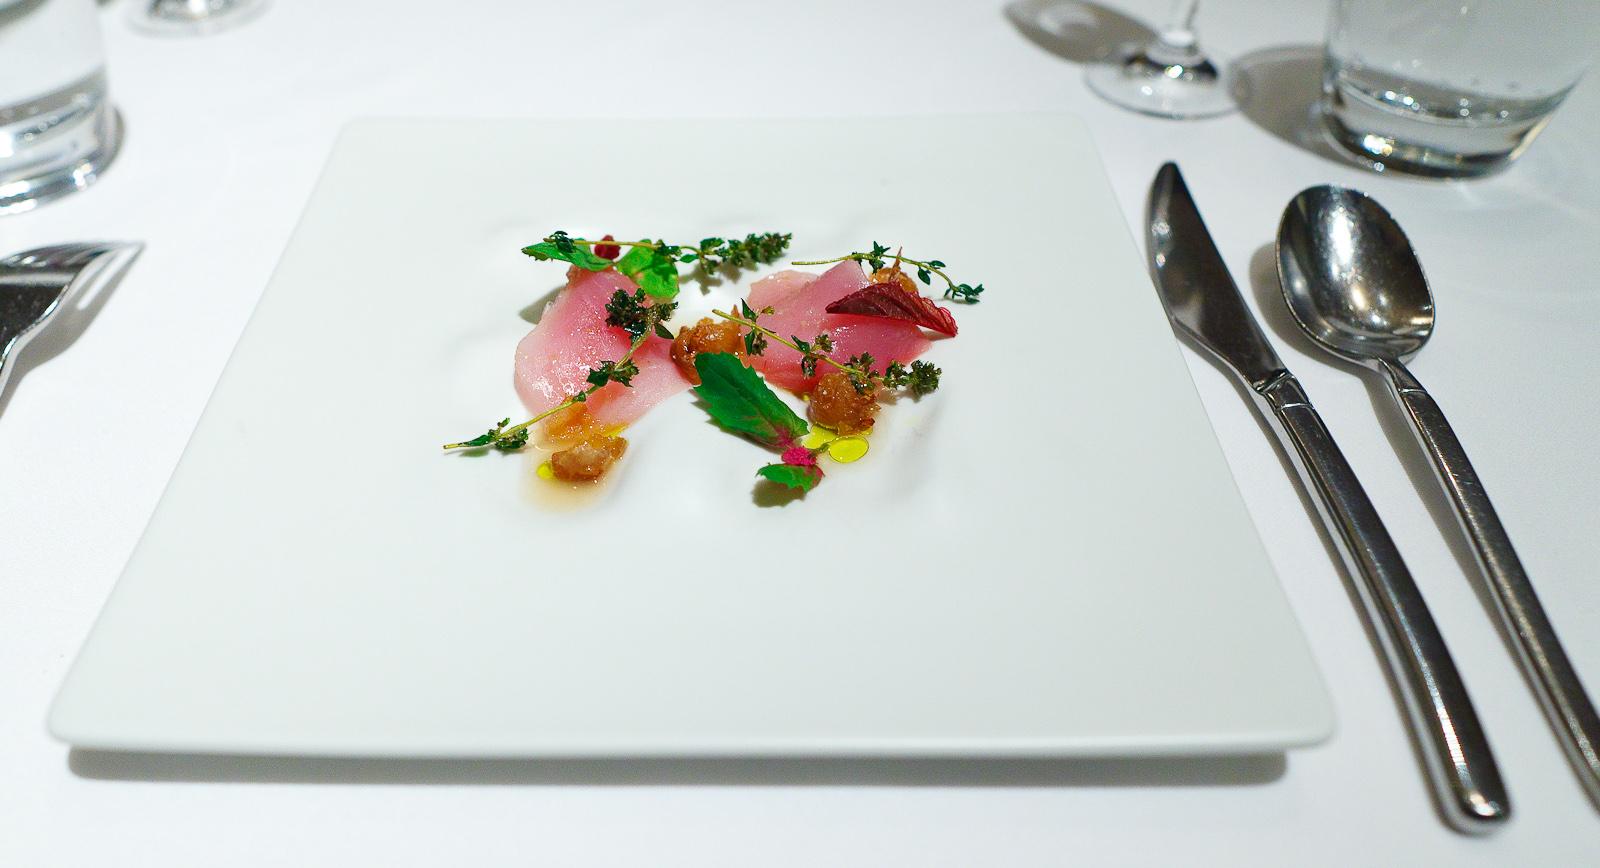 7th Course: Albacore tuna, runner beans, crispy bean shell bouillon, lemon verbena, olive oil